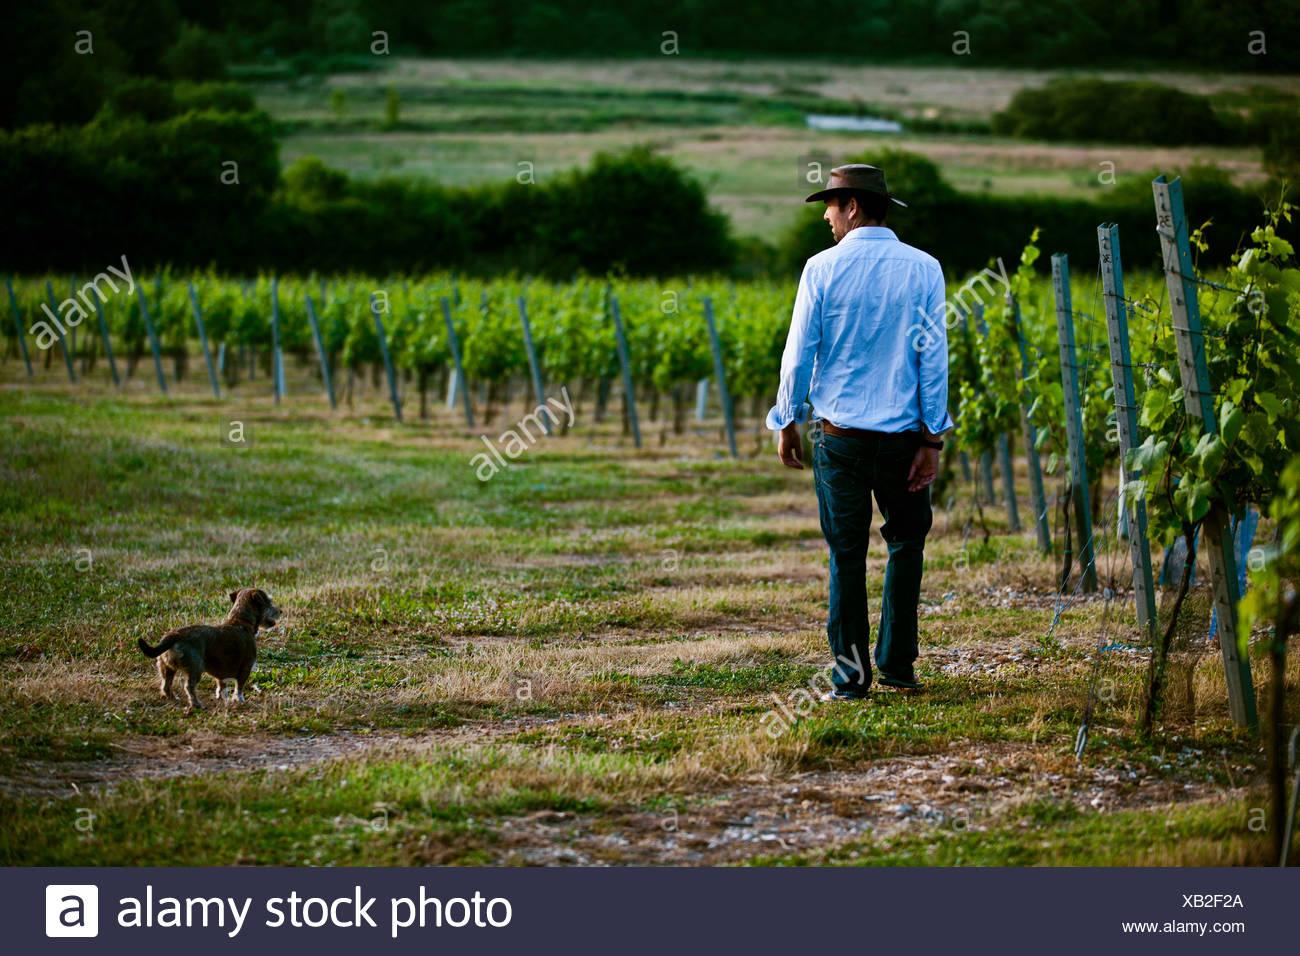 Mid adult man and dog monitoring wine and champagne vineyard, Cottonworth, Hampshire, UK - Stock Image